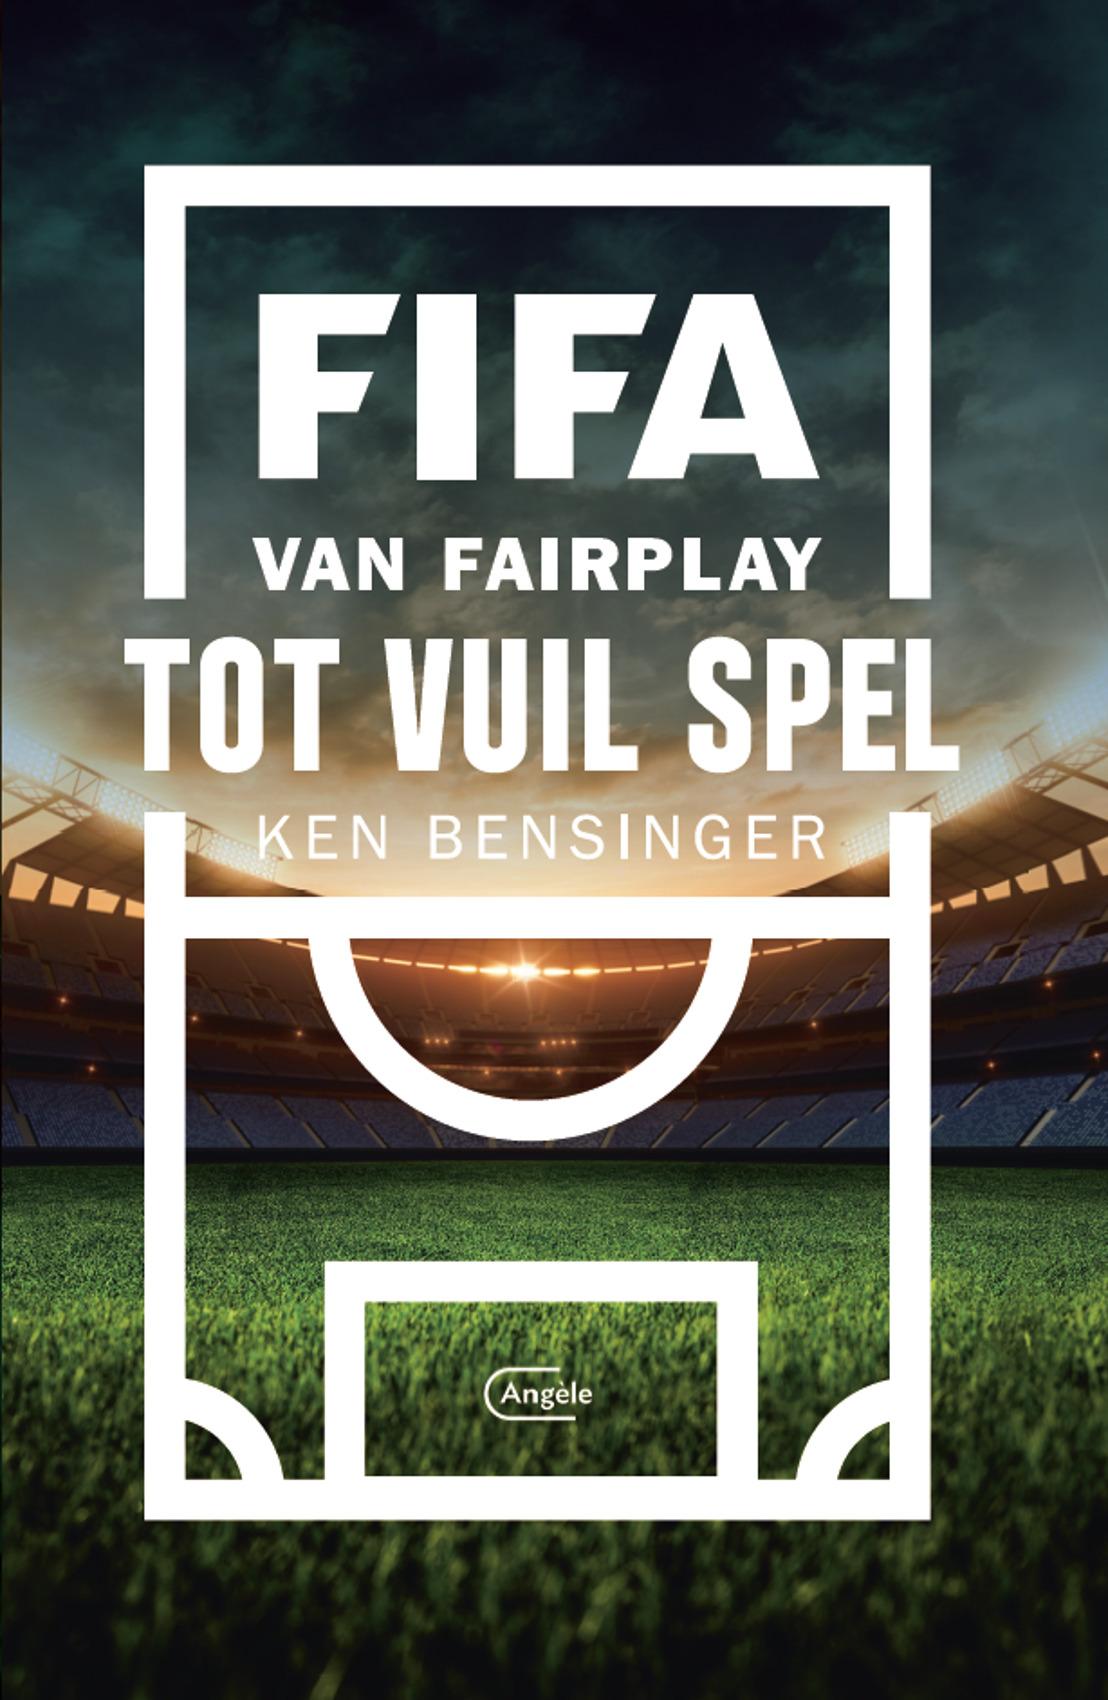 FIFA. Van fairplay tot vuil spel